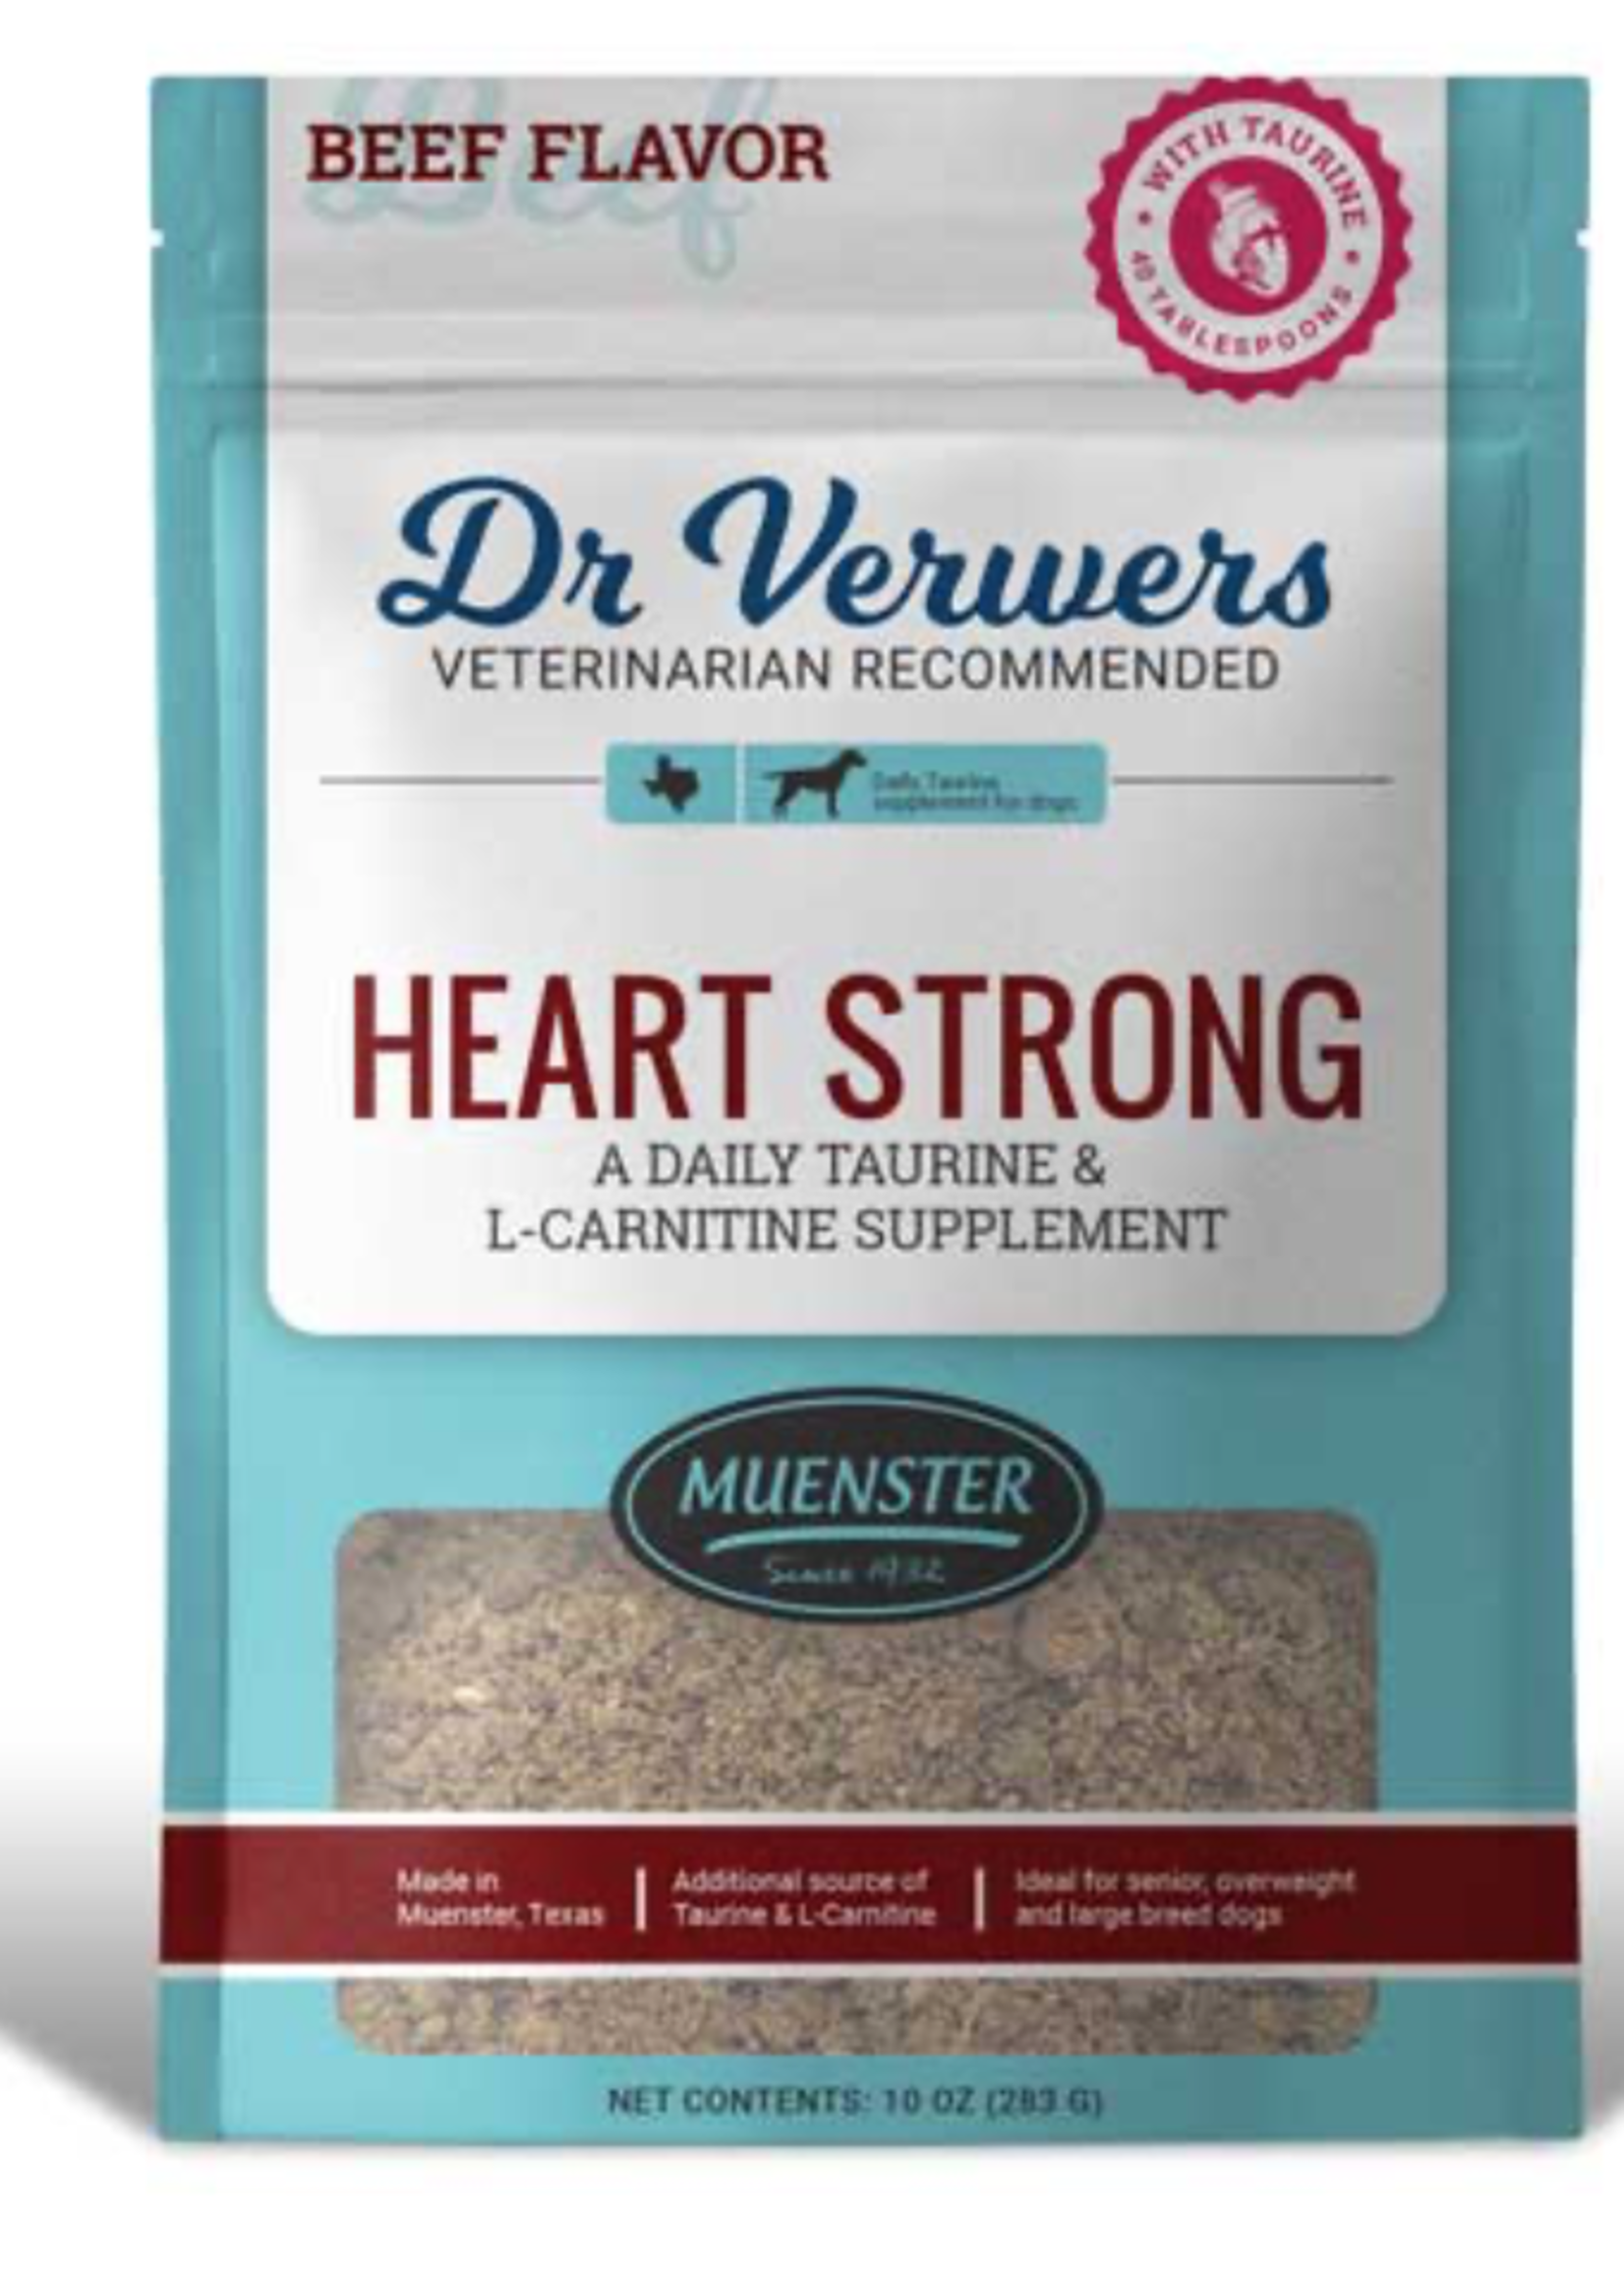 Muenster Milling Co Dr Verwers Heartstrong Beef 10oz